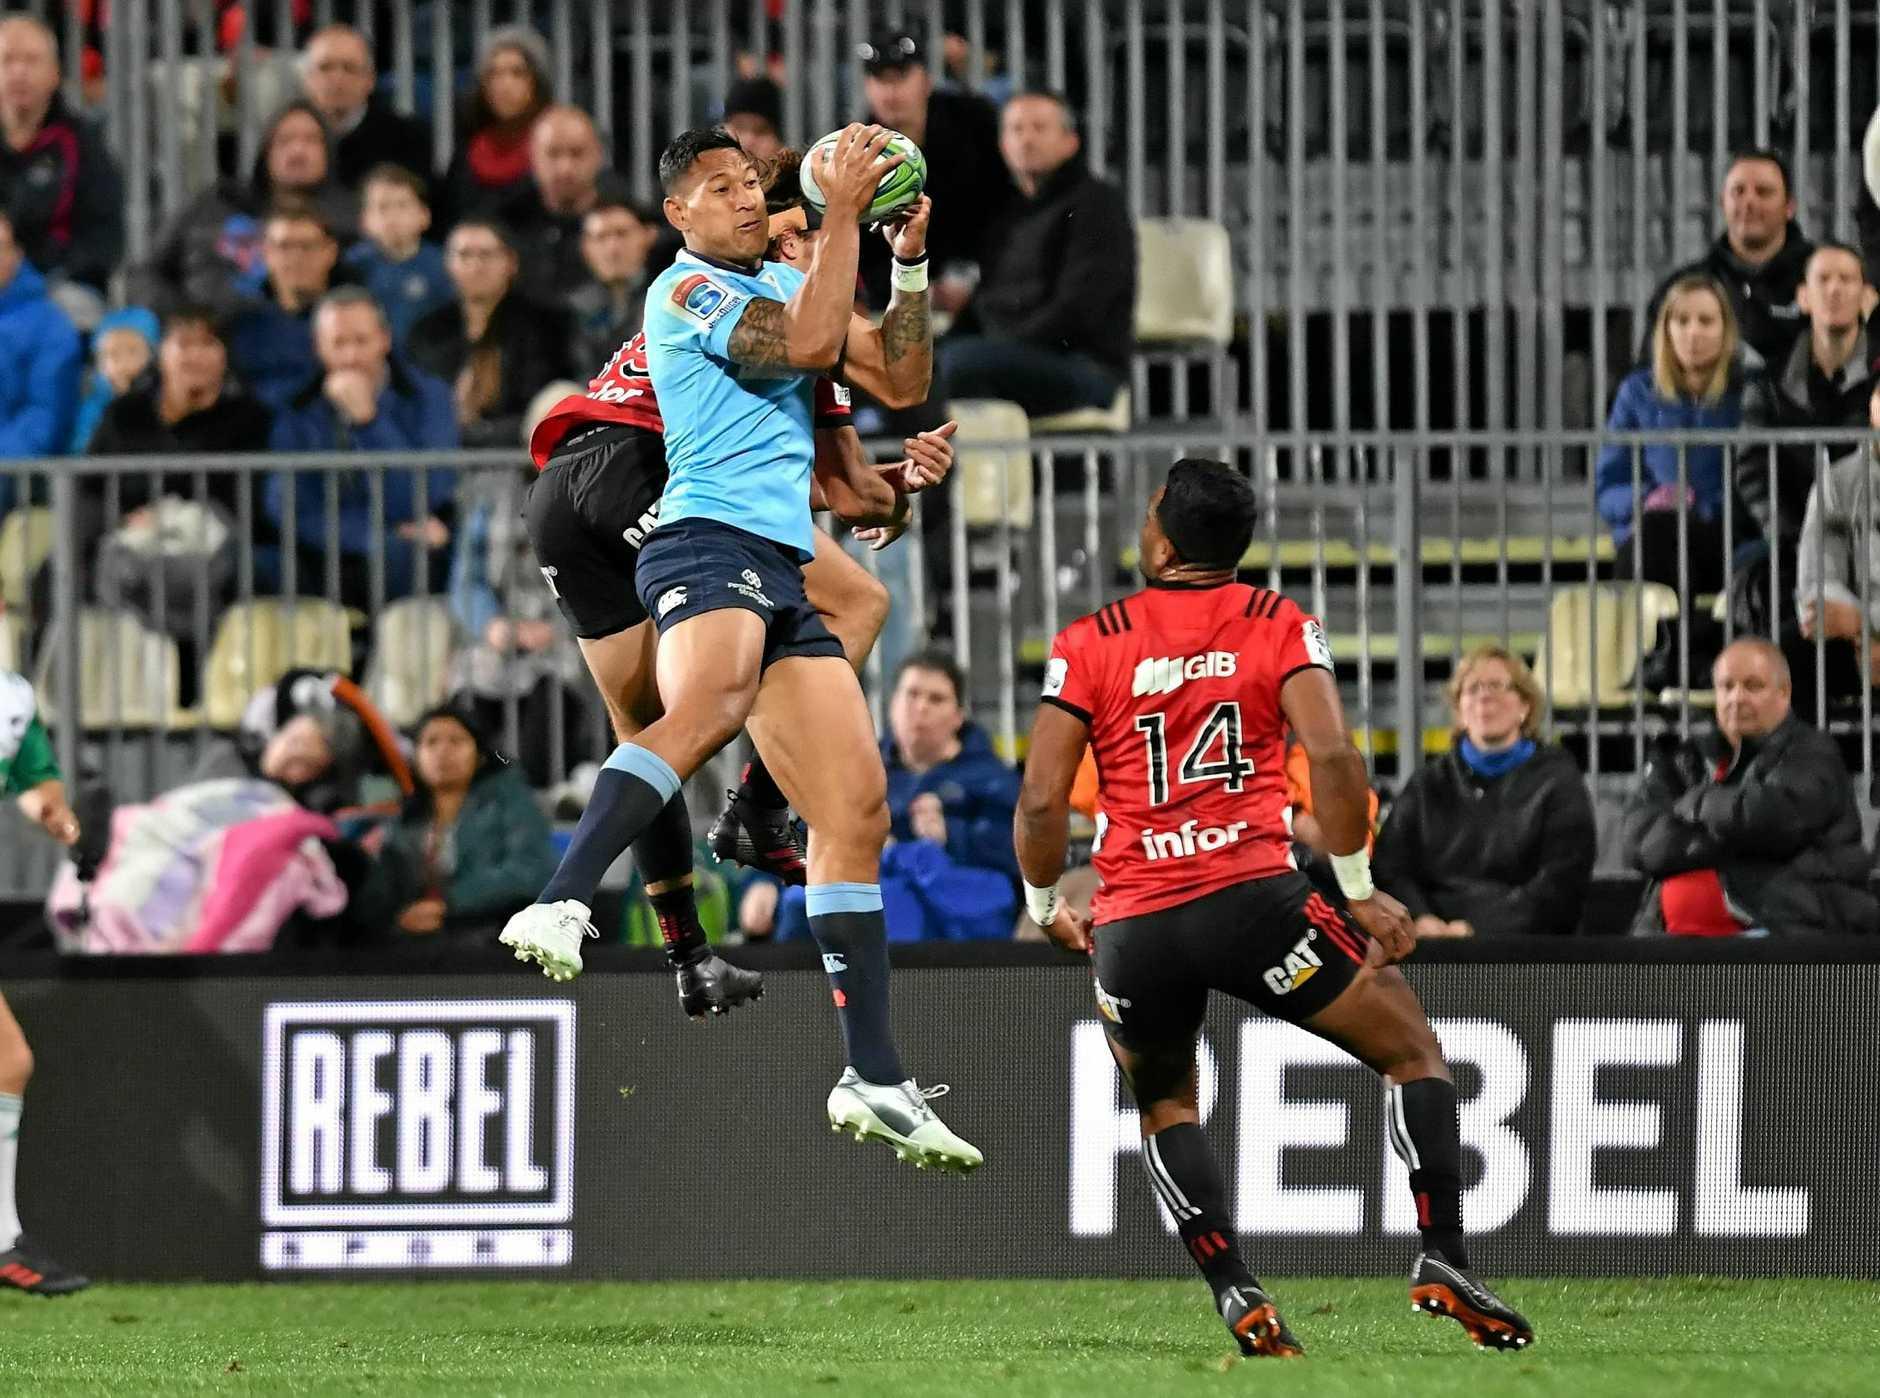 The Waratahs' Israel Folau flies high against the Crusaders at Christchurch's AMI Stadium on Saturday.